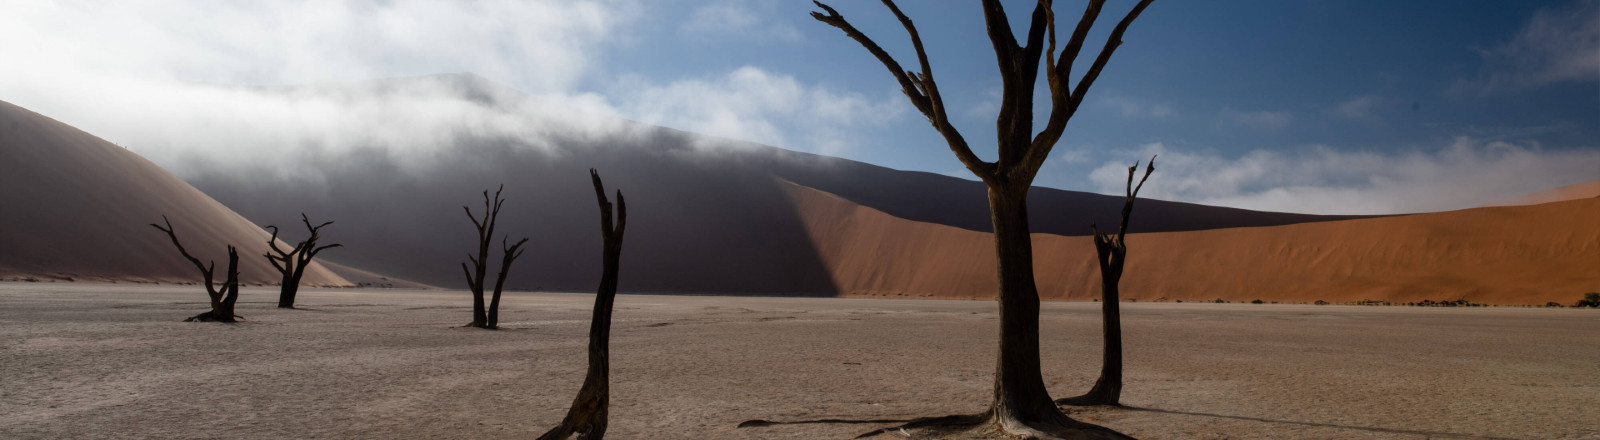 Tote Bäume und auflösender Nebel im Deadvlei, Sossusvlei Namib Naukluft Nationalpark, Namibia, Januar 2021, Symbolfoto Klimawandel